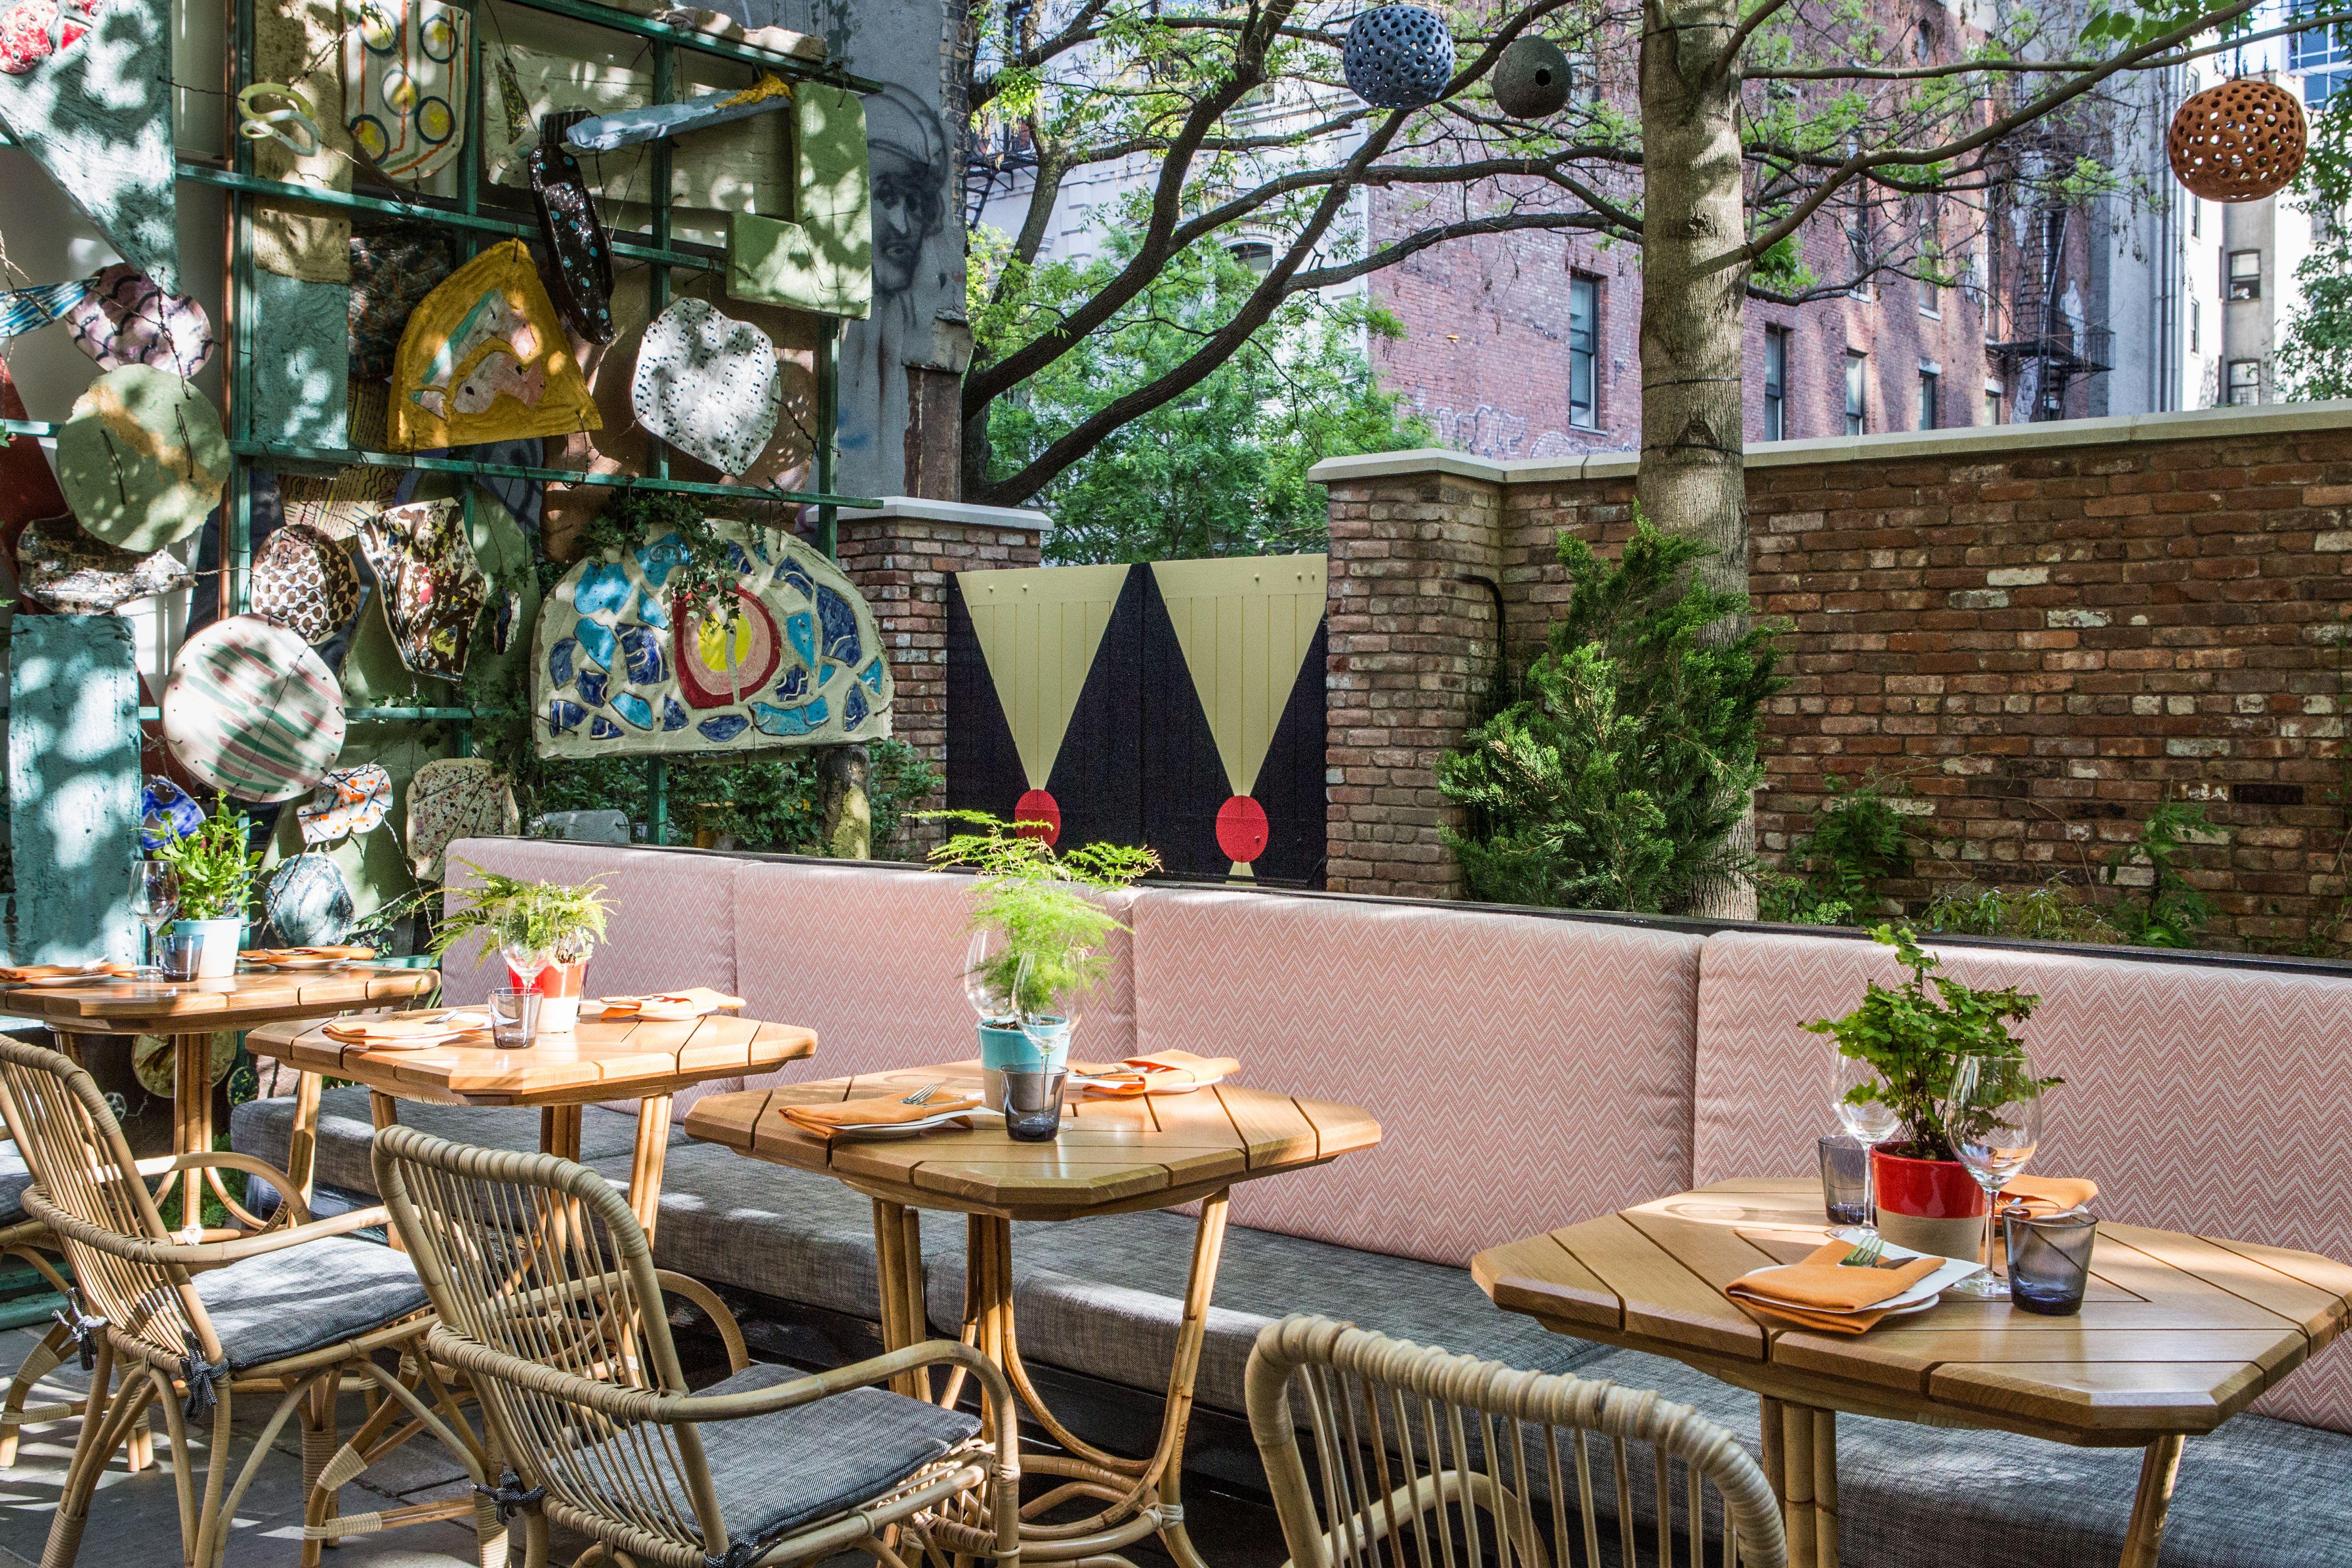 Chiceats 20 Must Visit Outdoor Restaurants Around The